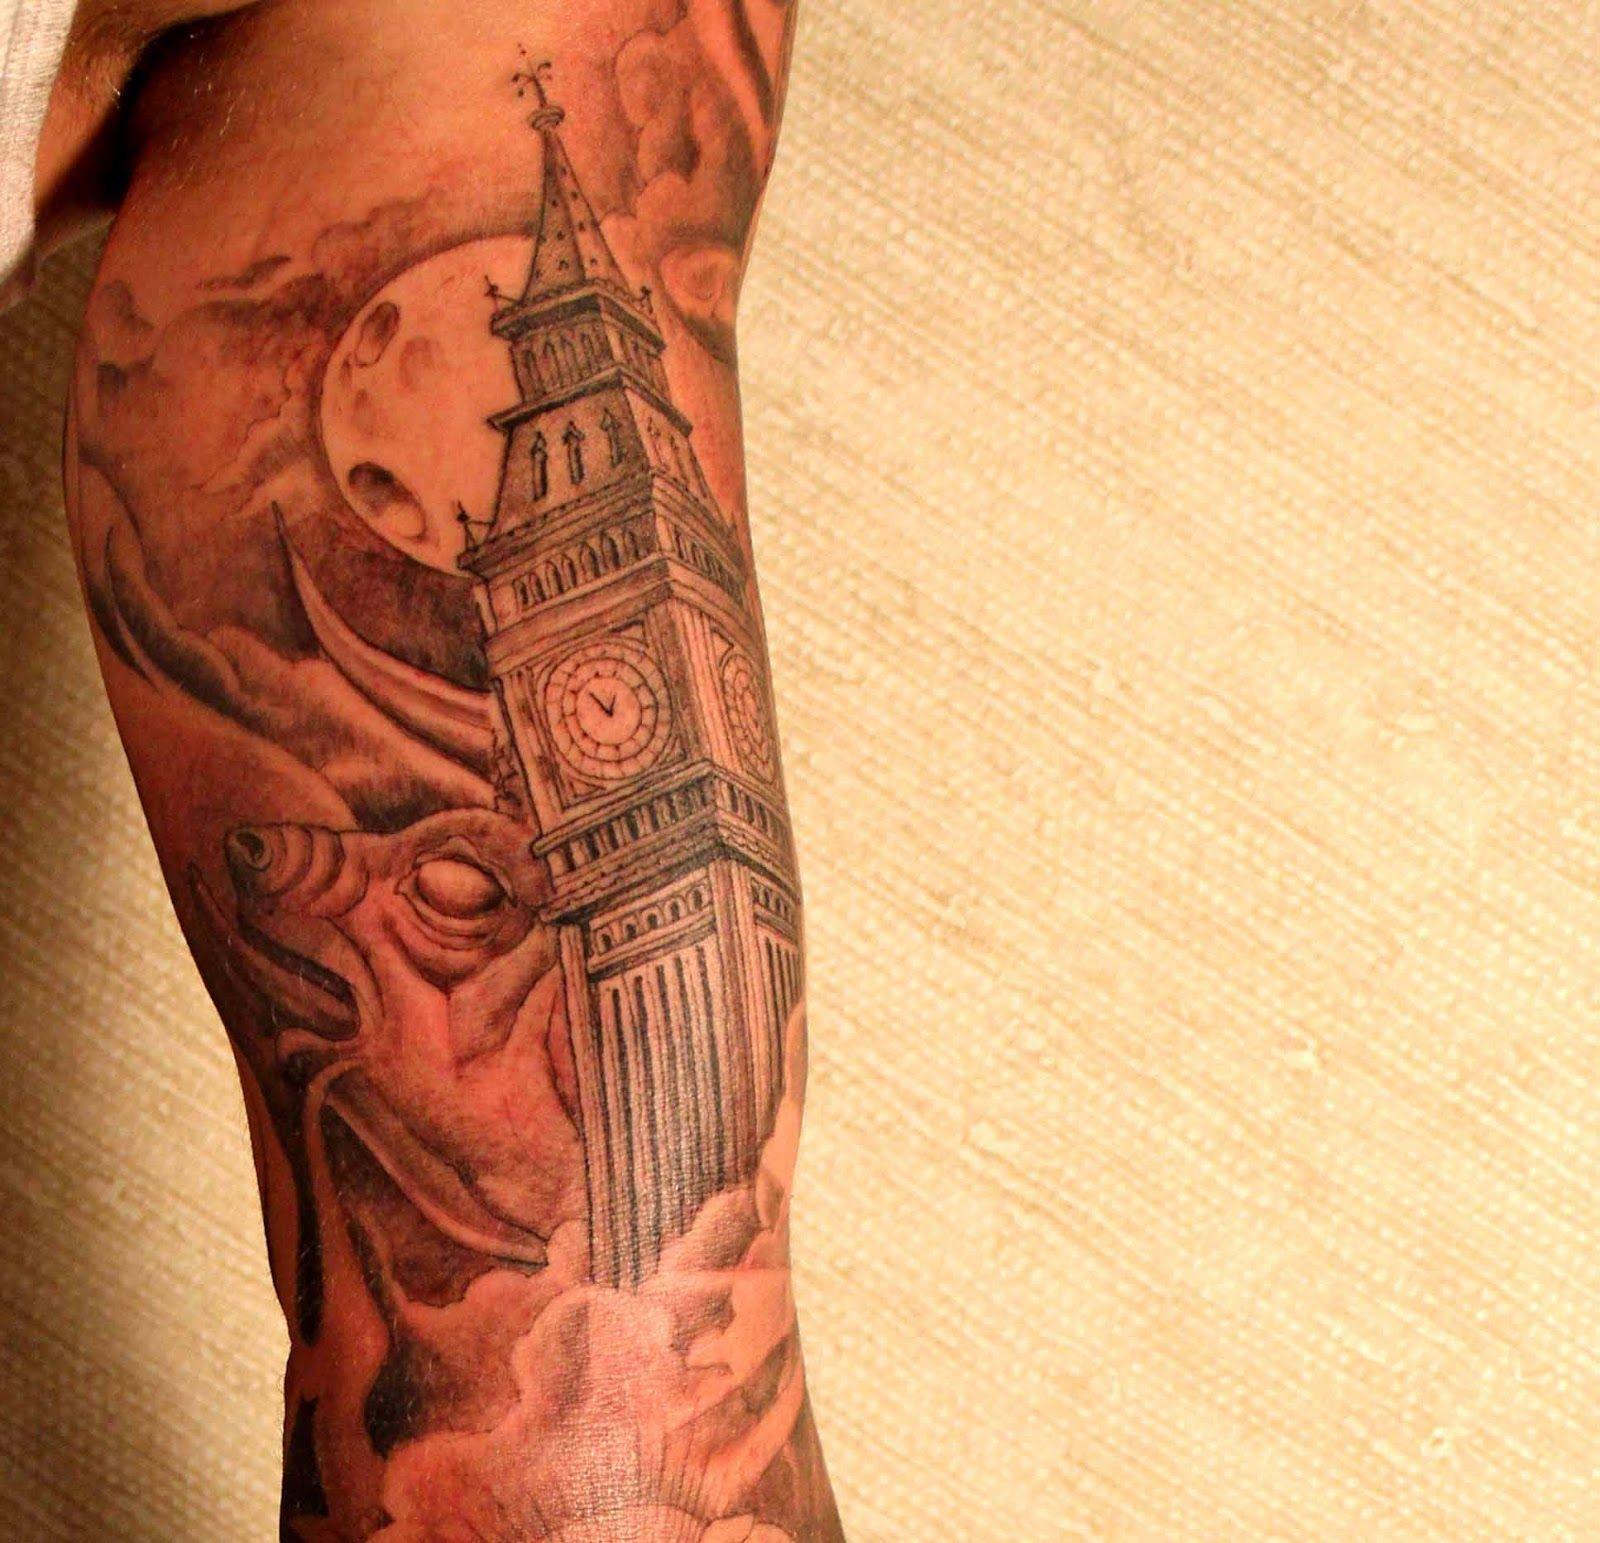 Big Ben | Tattoos | Pinterest